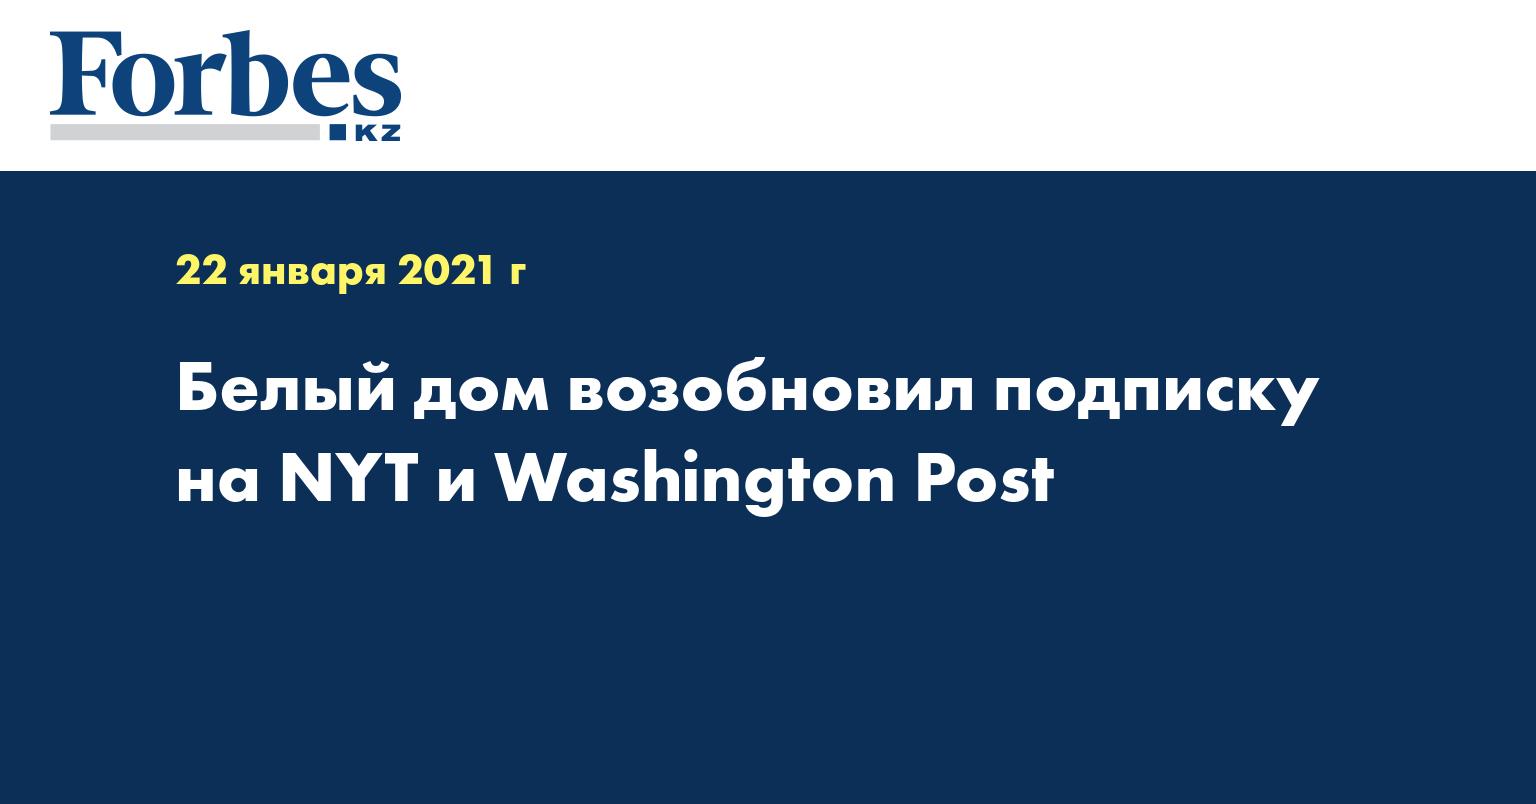 Белый дом возобновил подписку на NYT и Washington Post